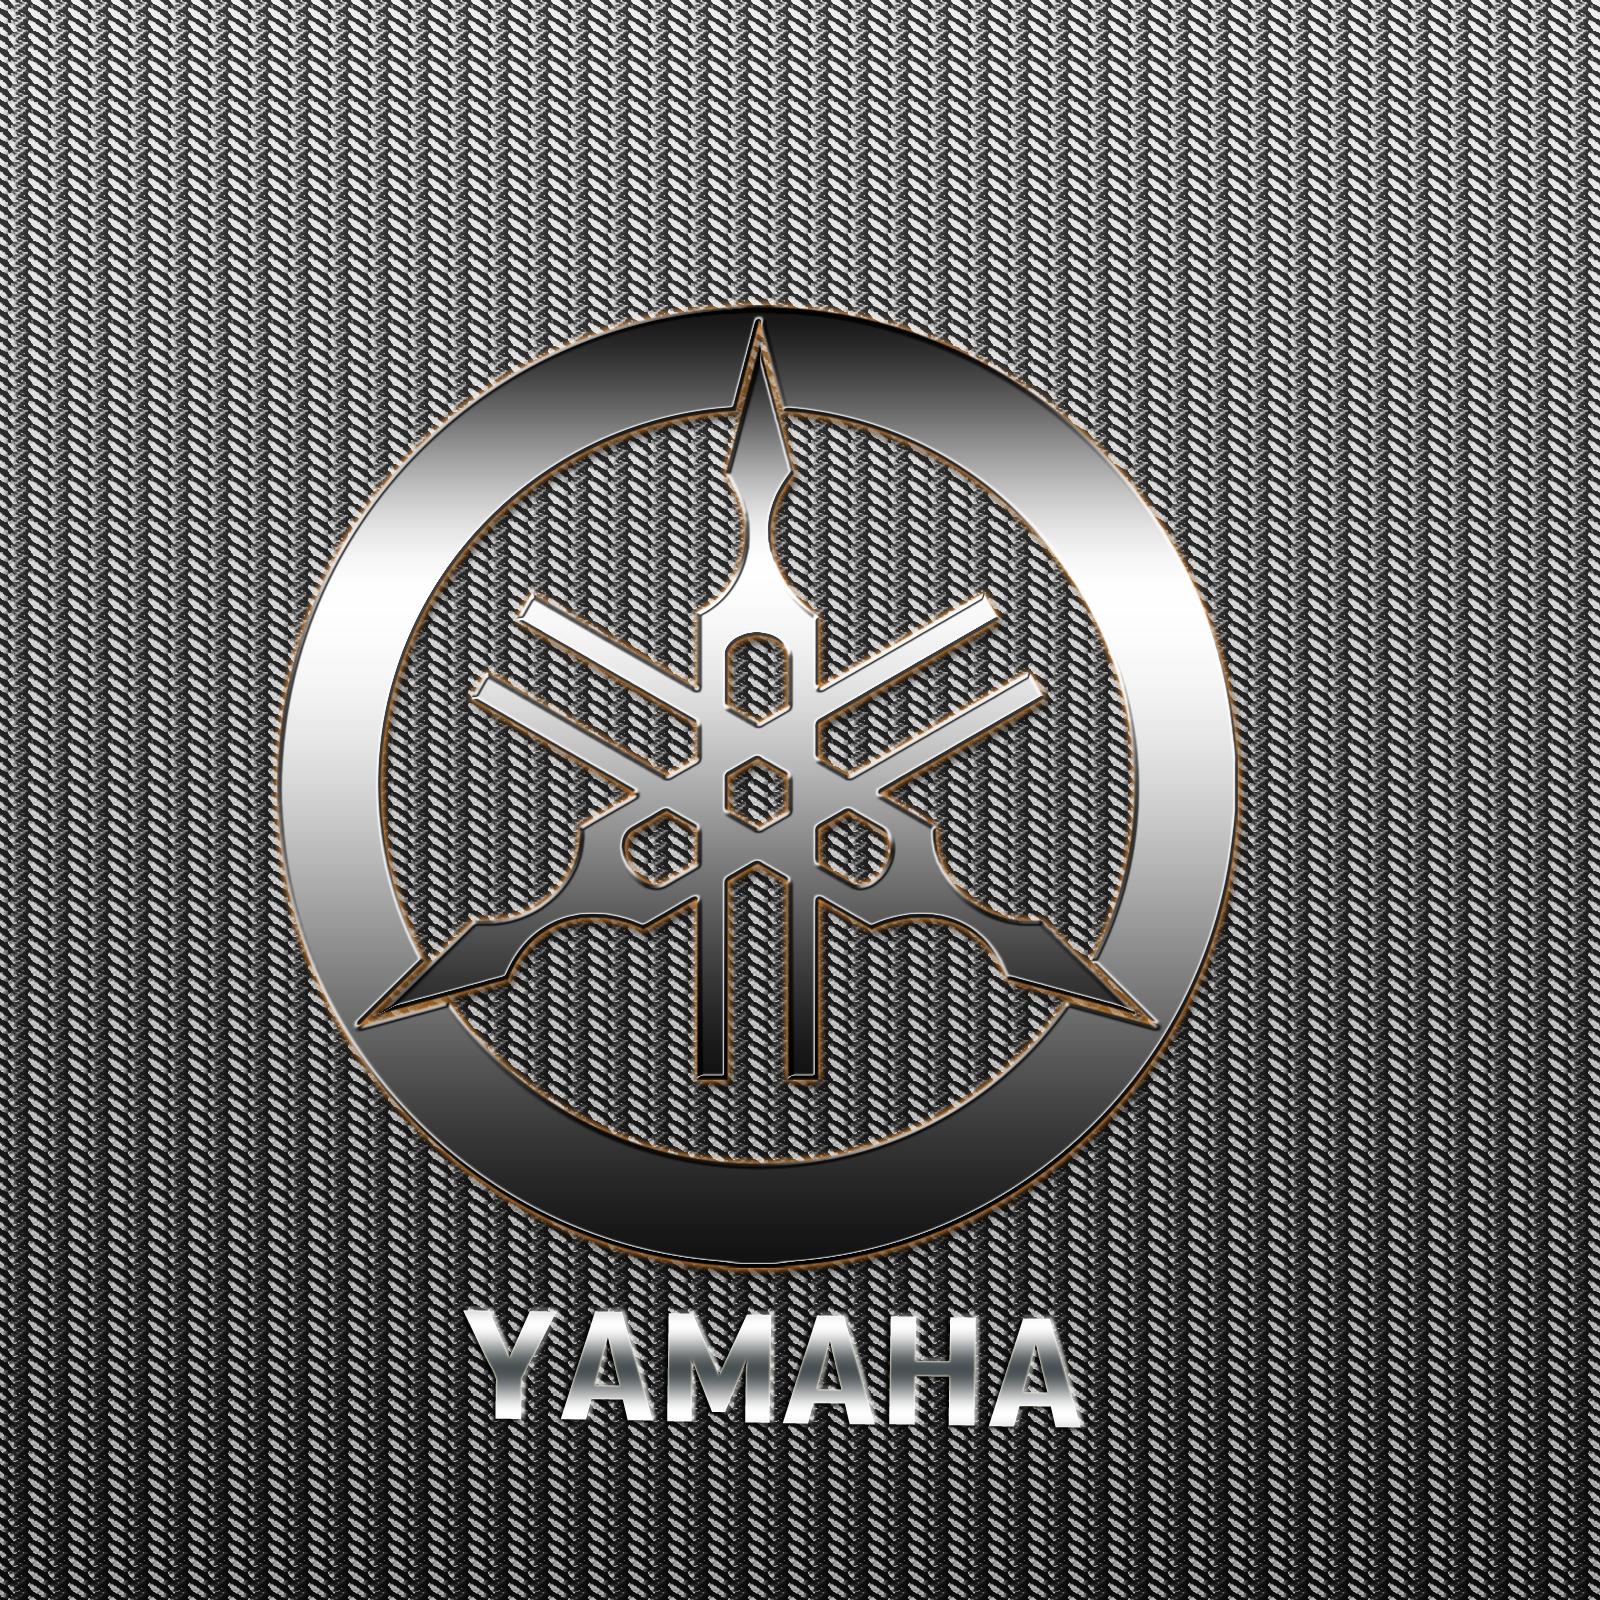 history of all logos all yamaha logos yamaha logo style guide yamaha logistics manager